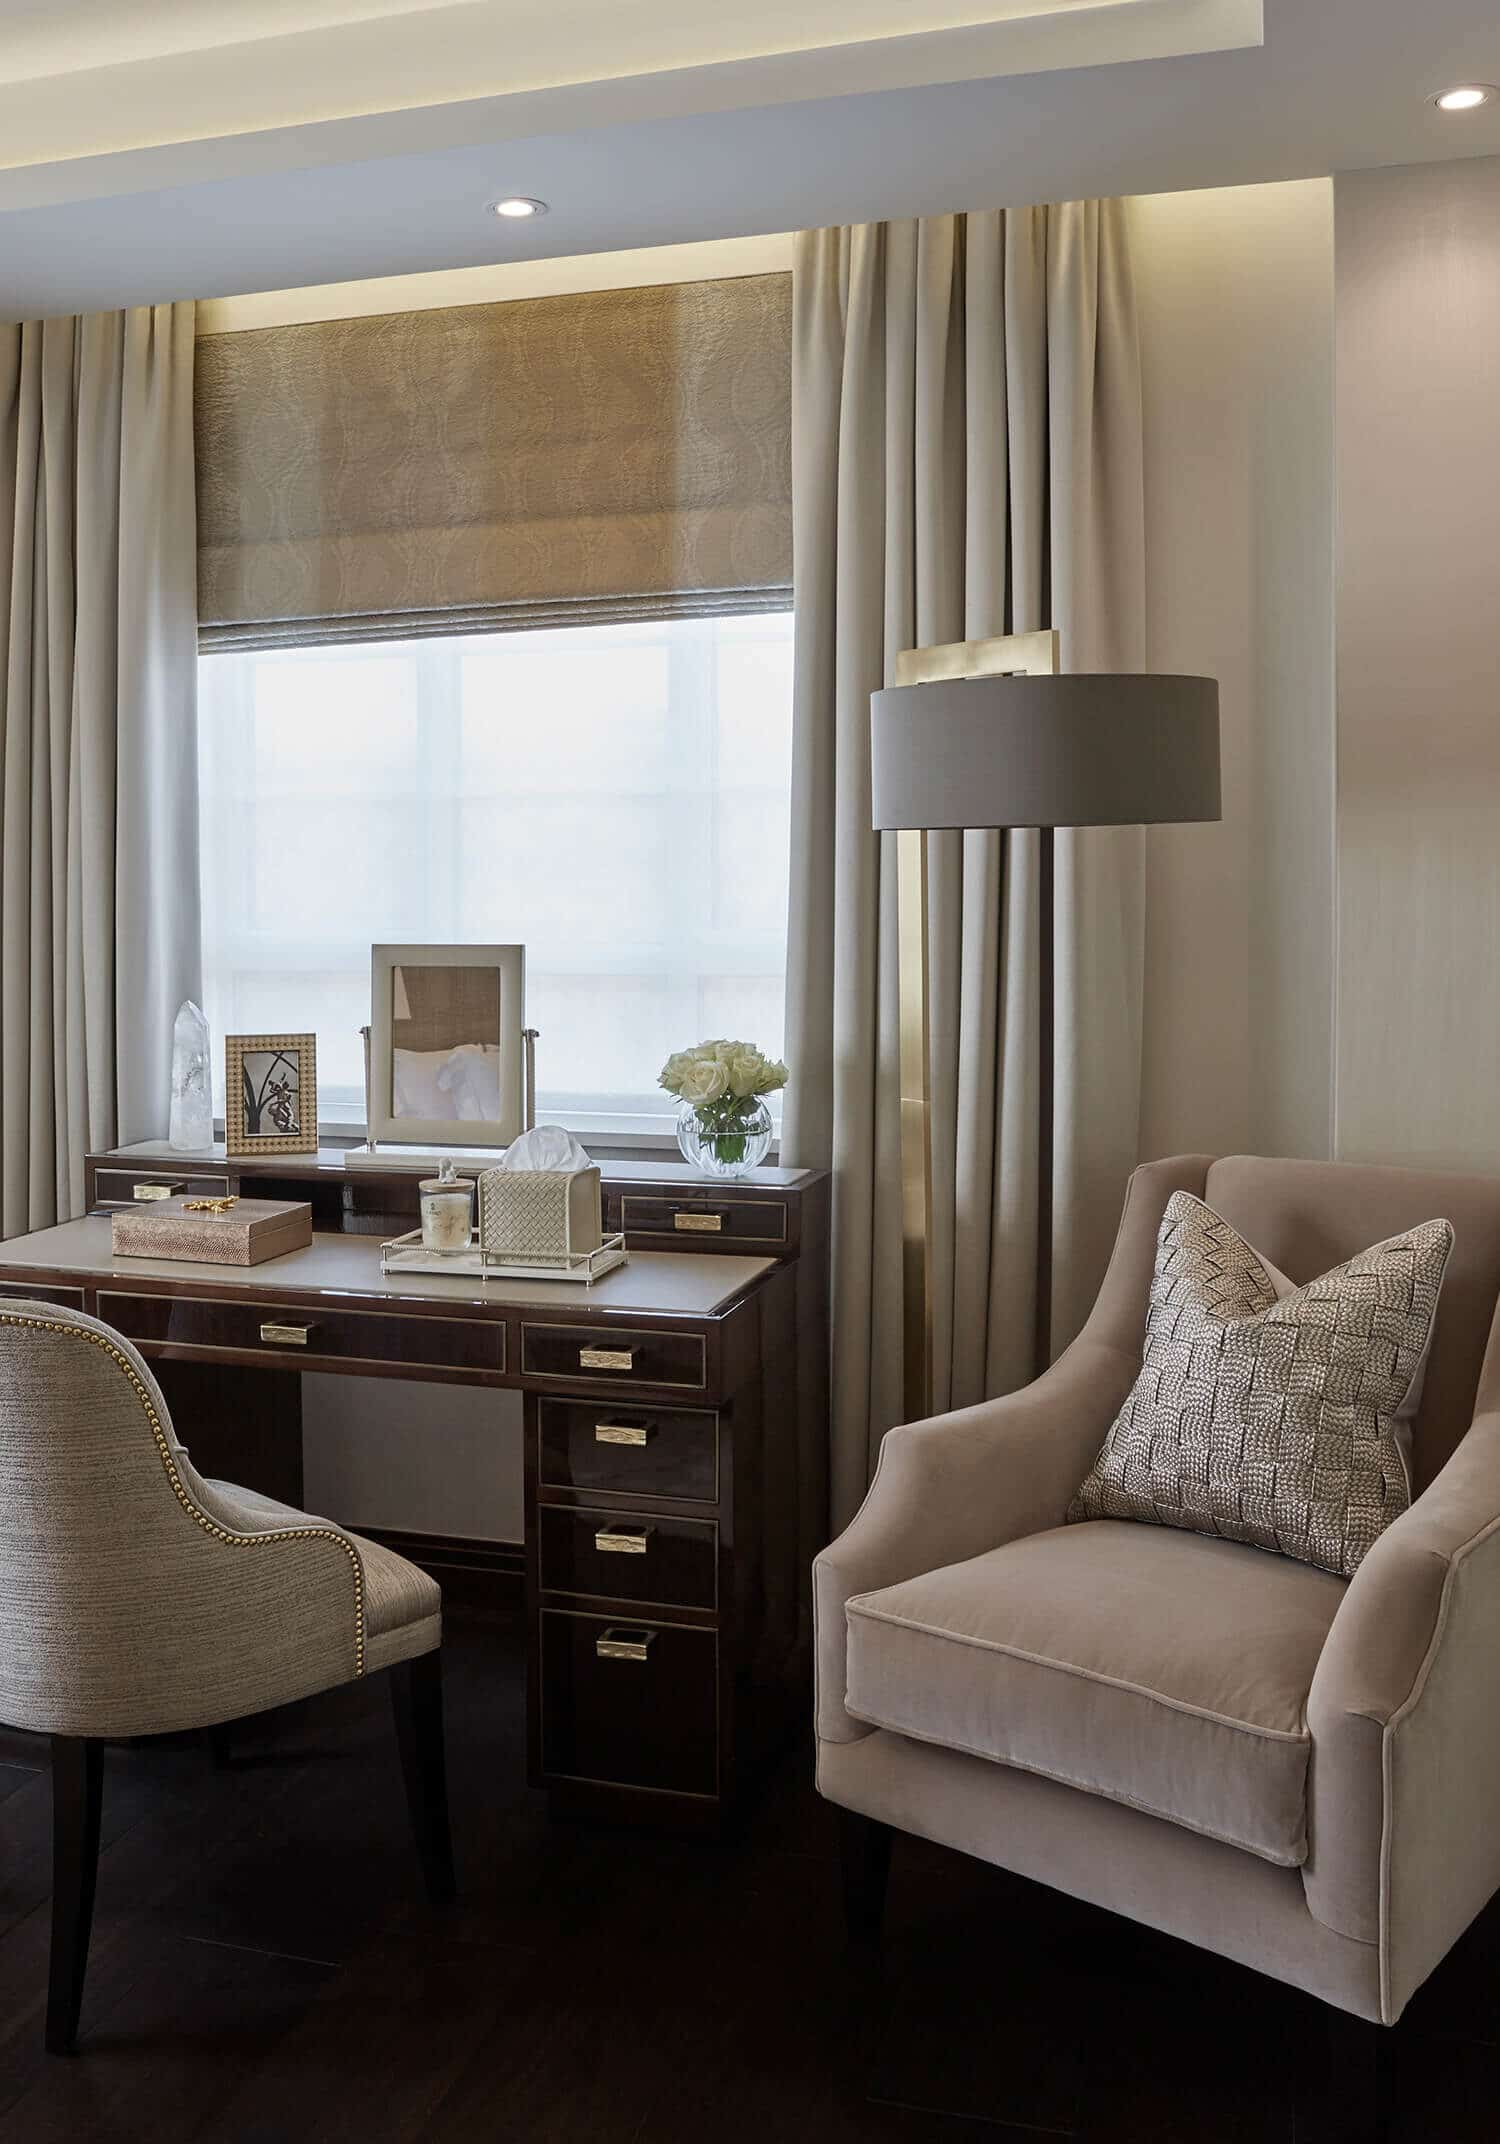 Hyde Park interior designer